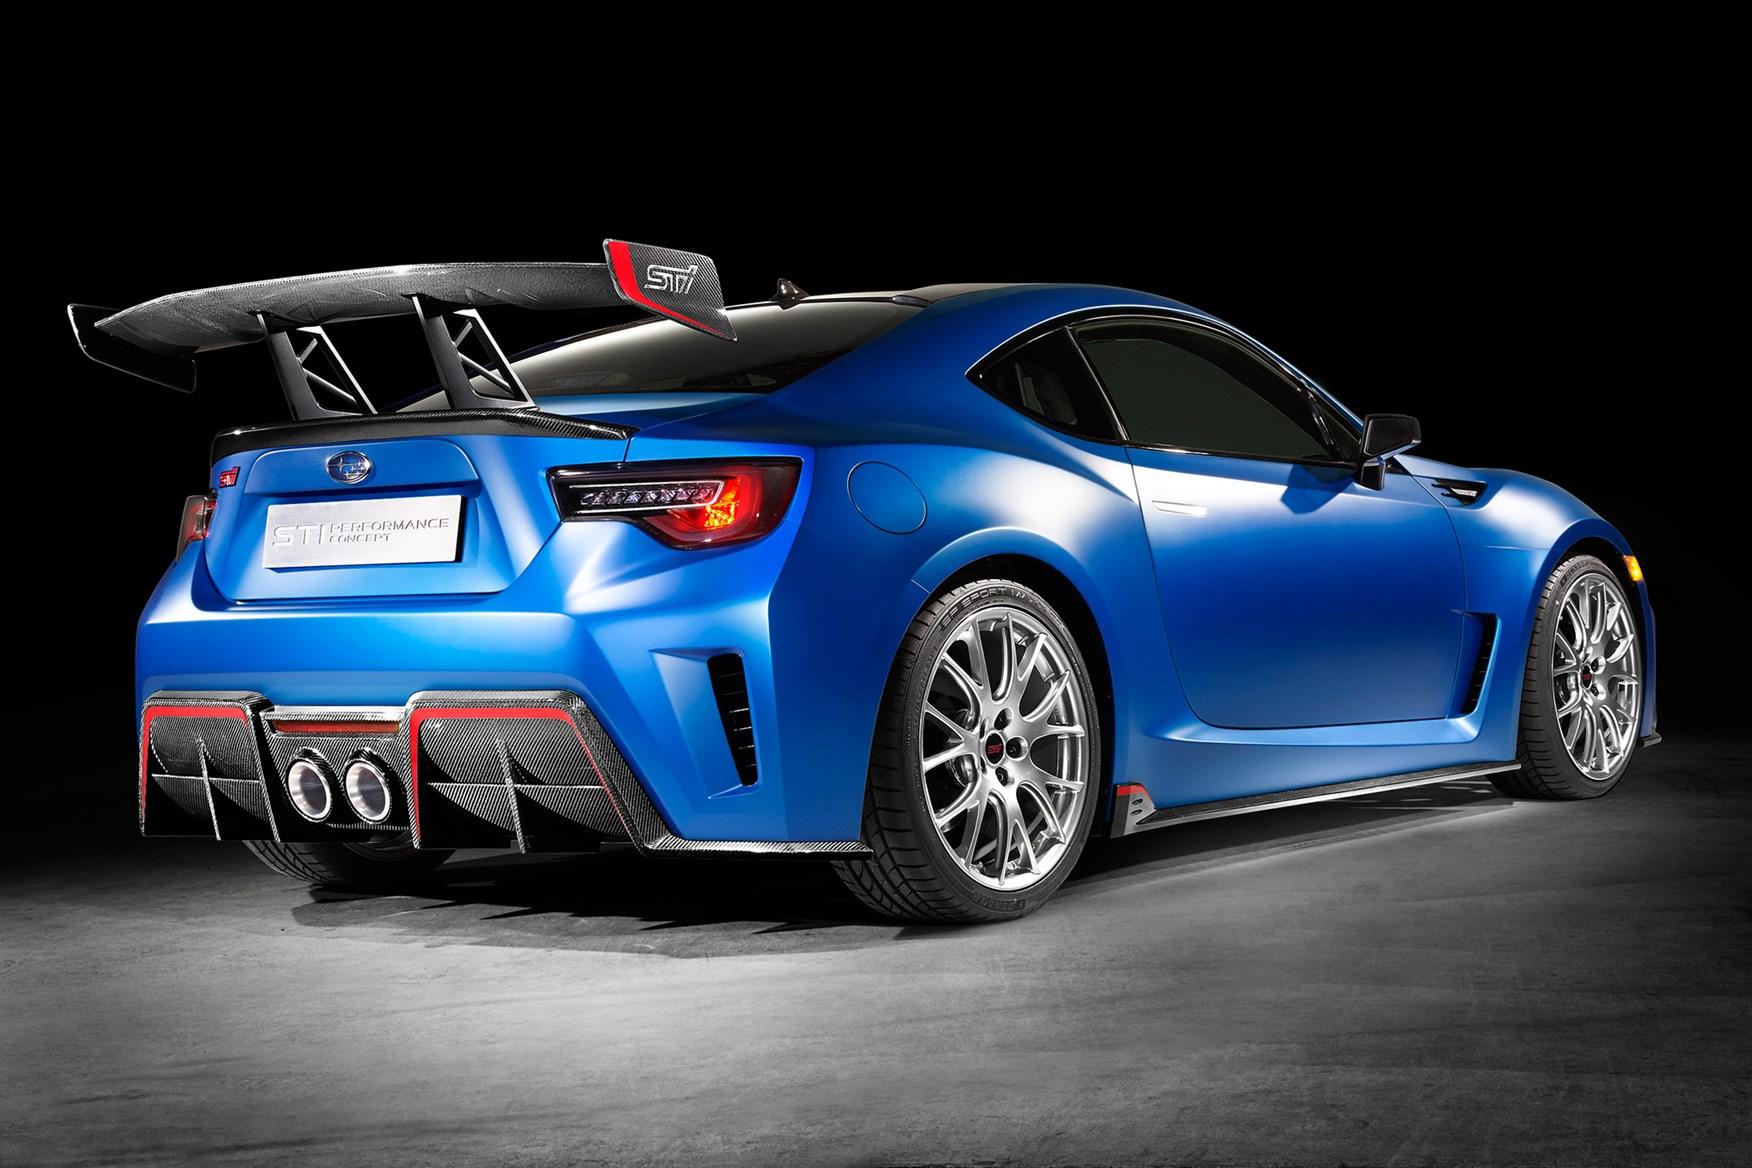 Meet The 300bhp Subaru Brz